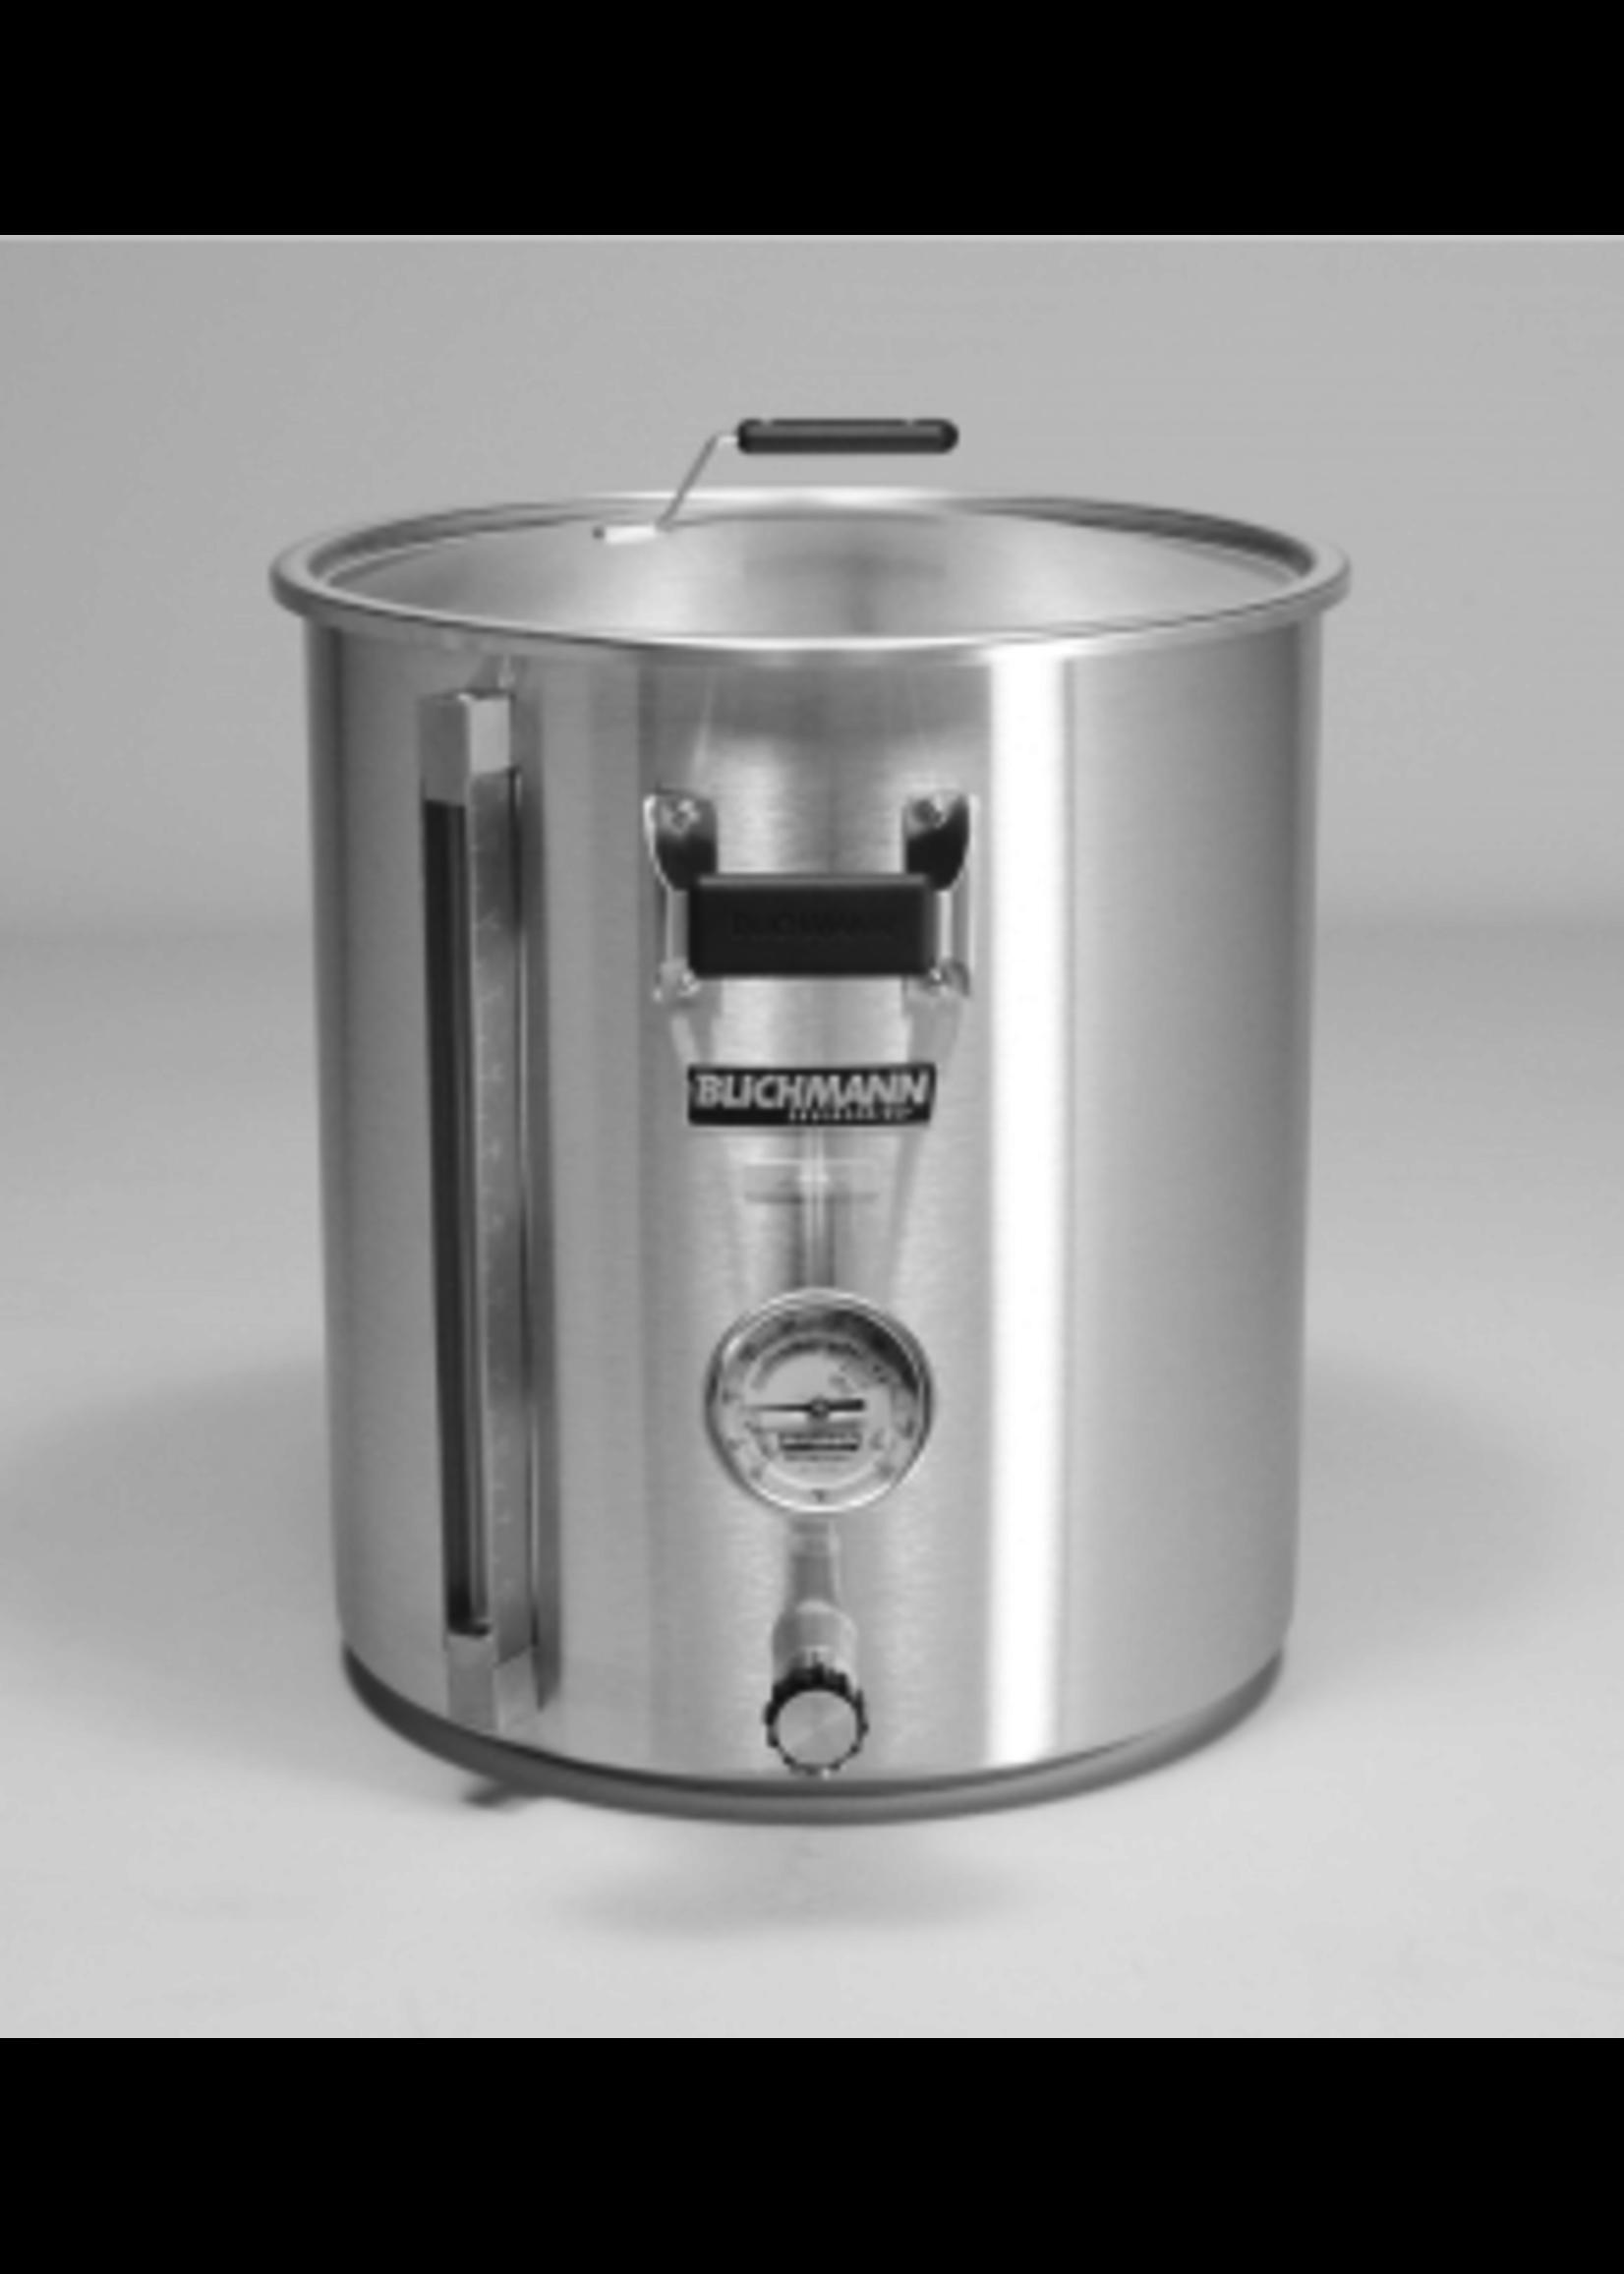 Blichmann Blichmann BoilerMaker G2 - 10 Gallon Standard Brew Kettle (Fahrenheit)